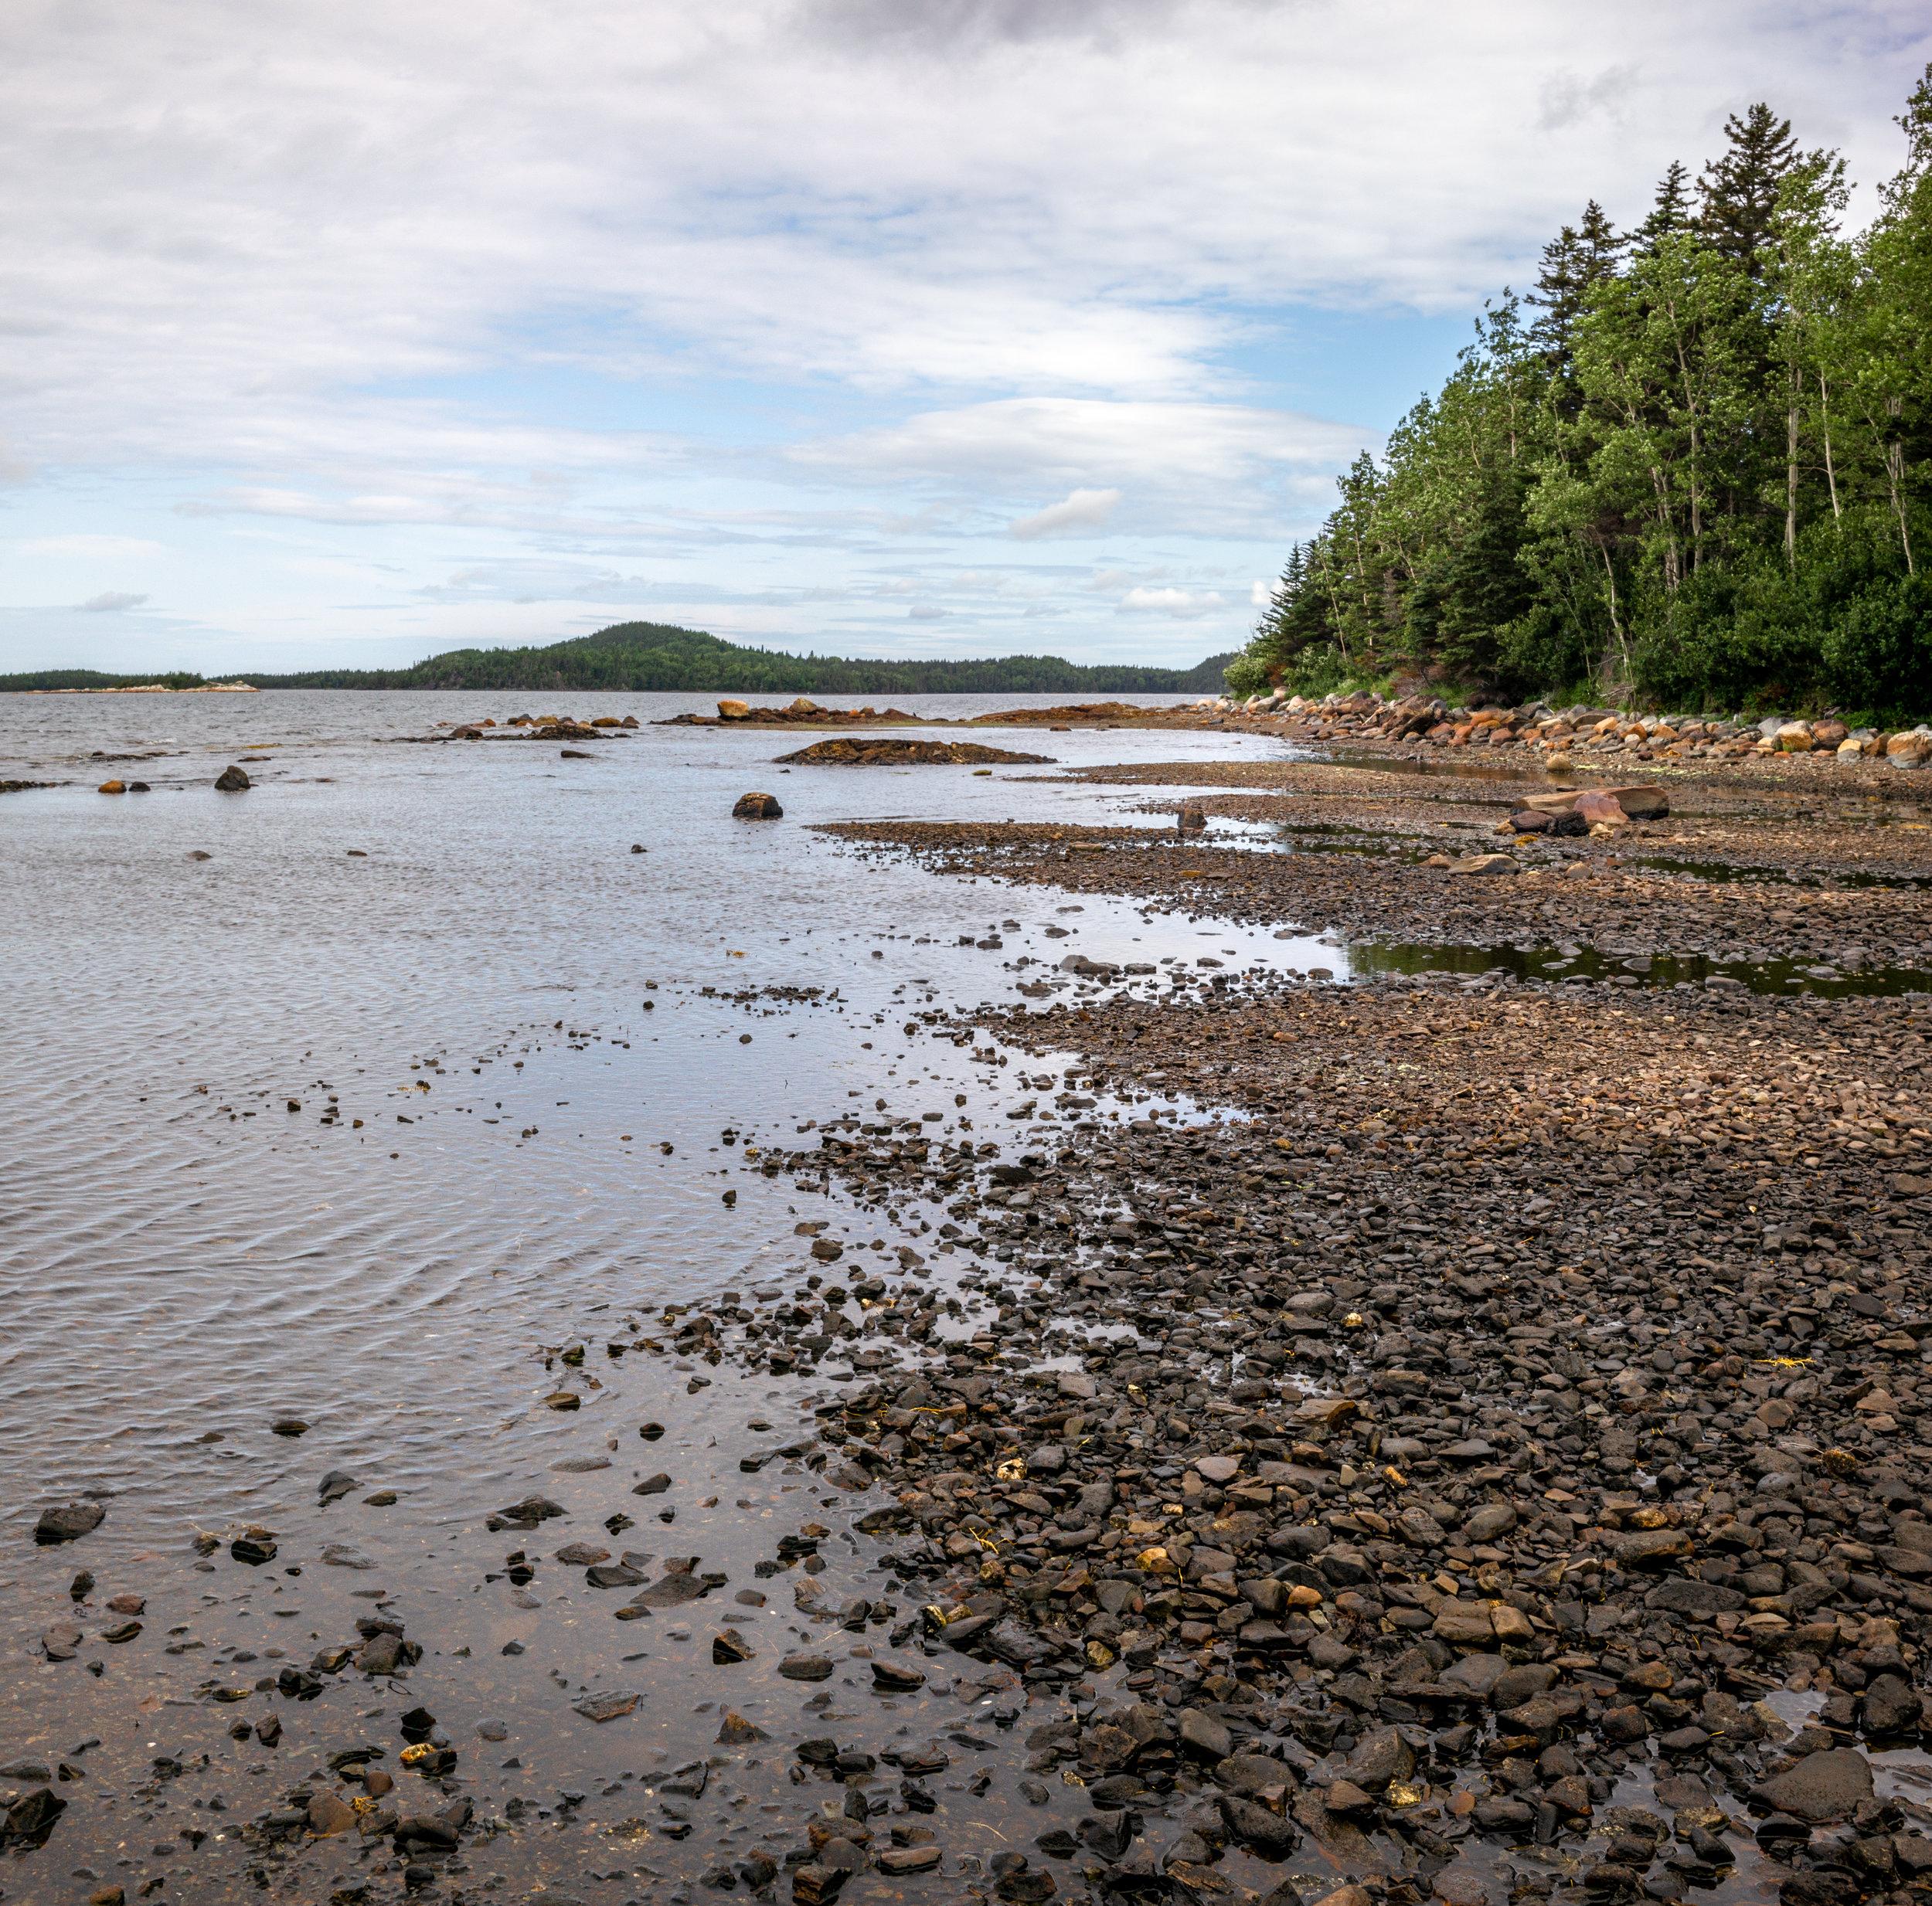 Shoreline of Boyd's Cove.